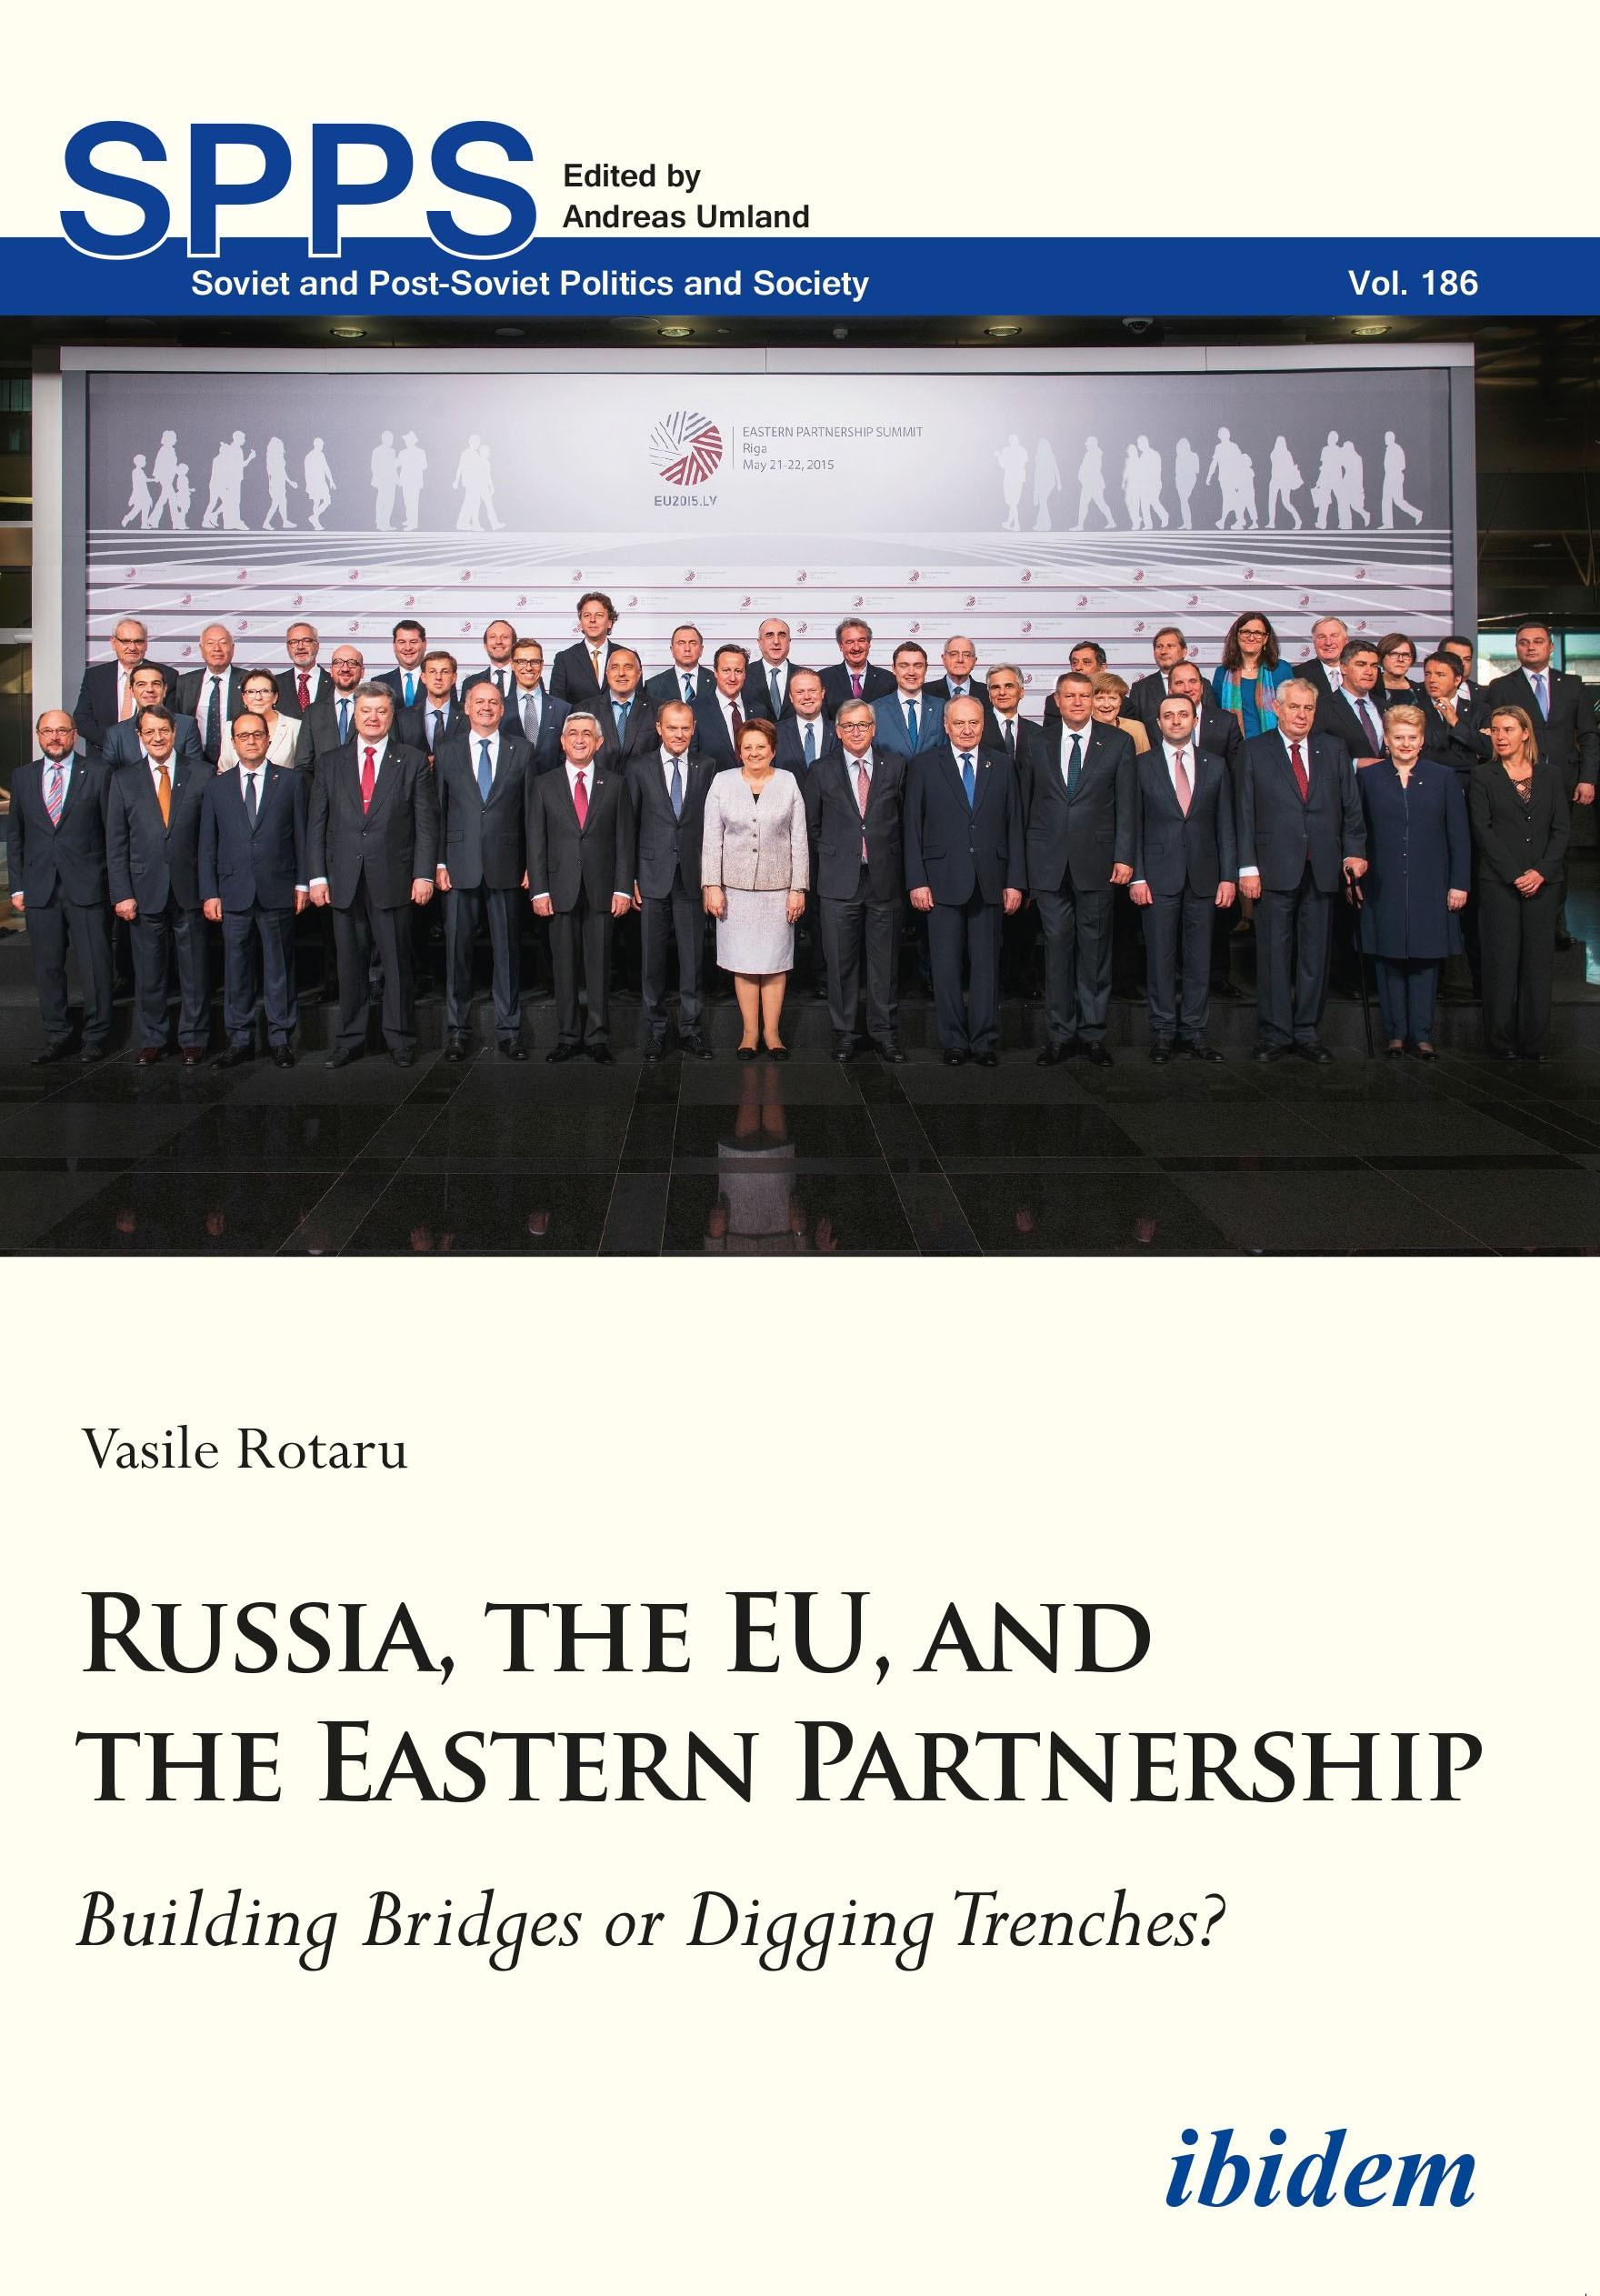 Russia, the EU, and the Eastern Partnership